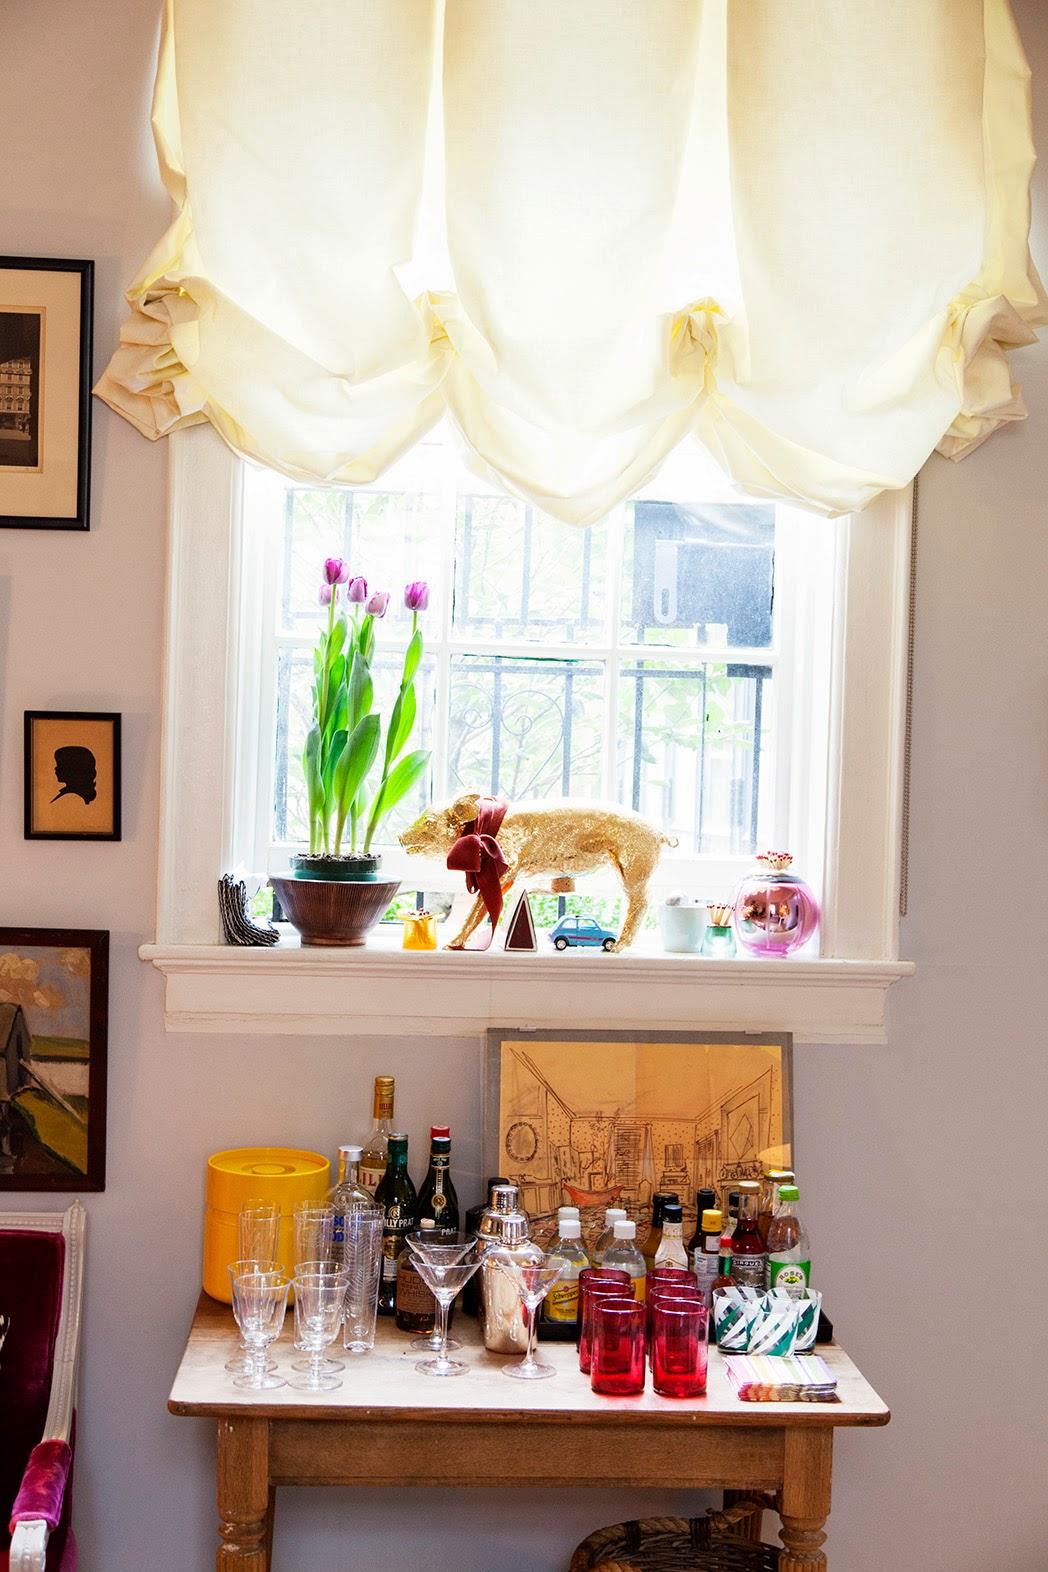 Decor Inspiration At Home With Rita Konig A Manhattan